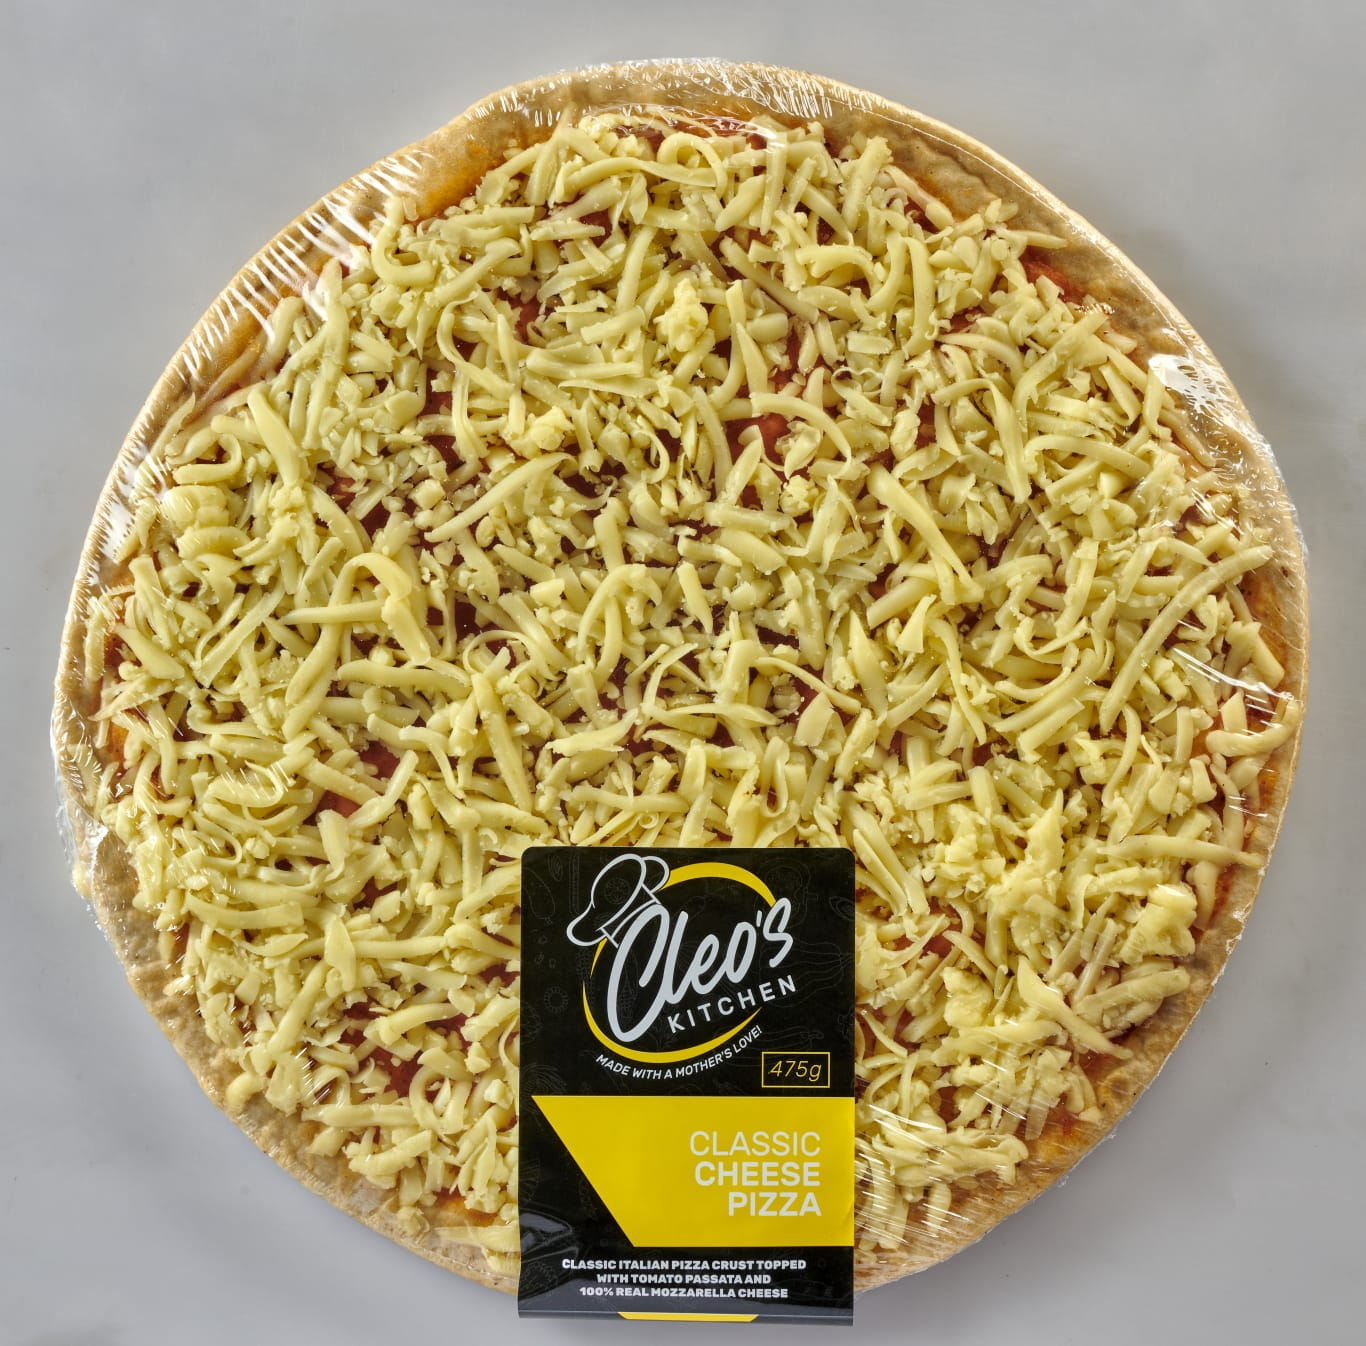 CLEO'S CLASSIC CHEESE – 475G